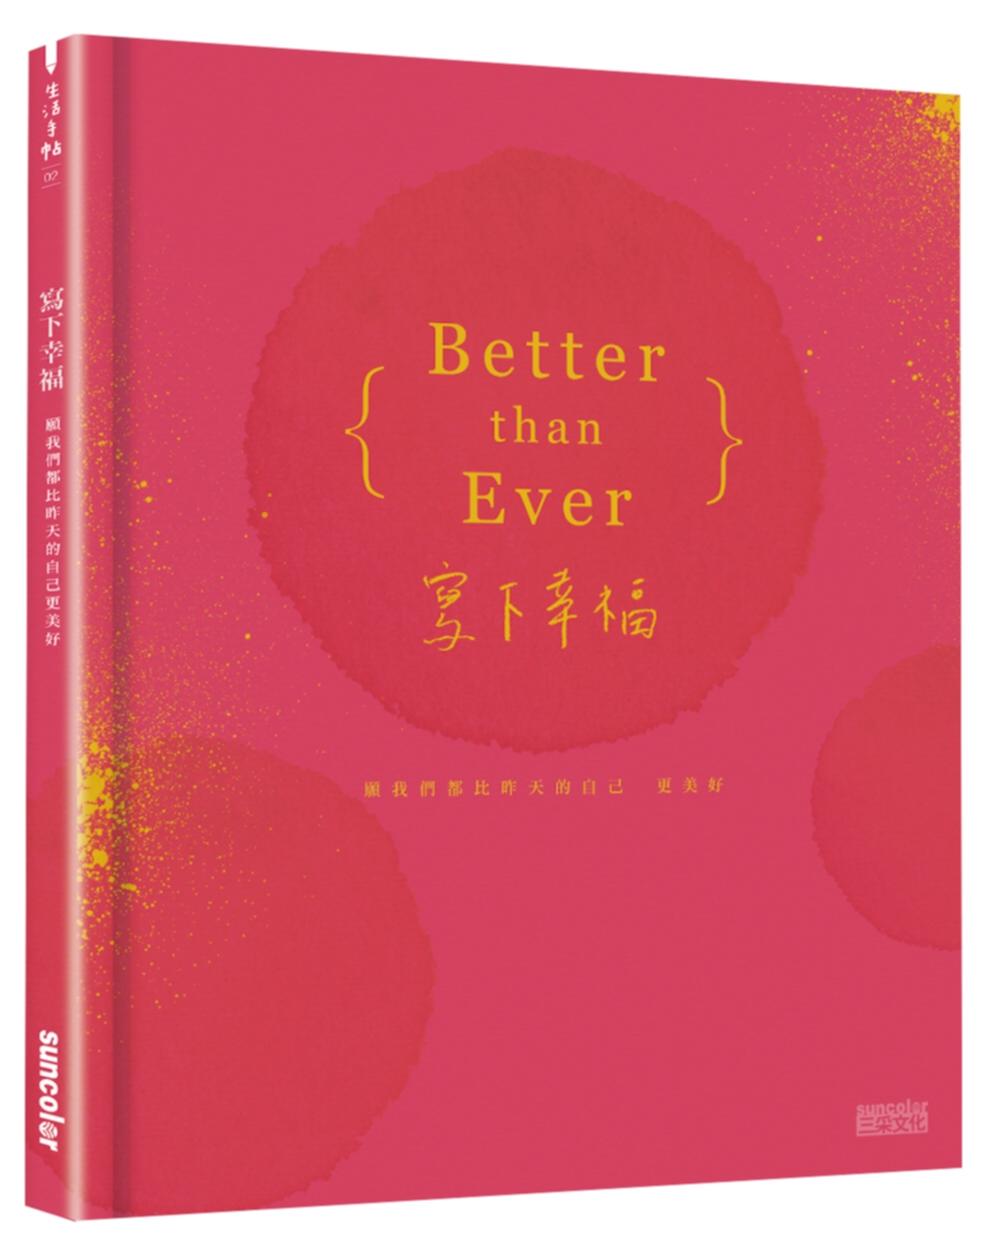 Better than Ever寫下幸福:願我們都比昨天的自己更美好(可讀、可寫、可畫,燙金版幸福許願書)